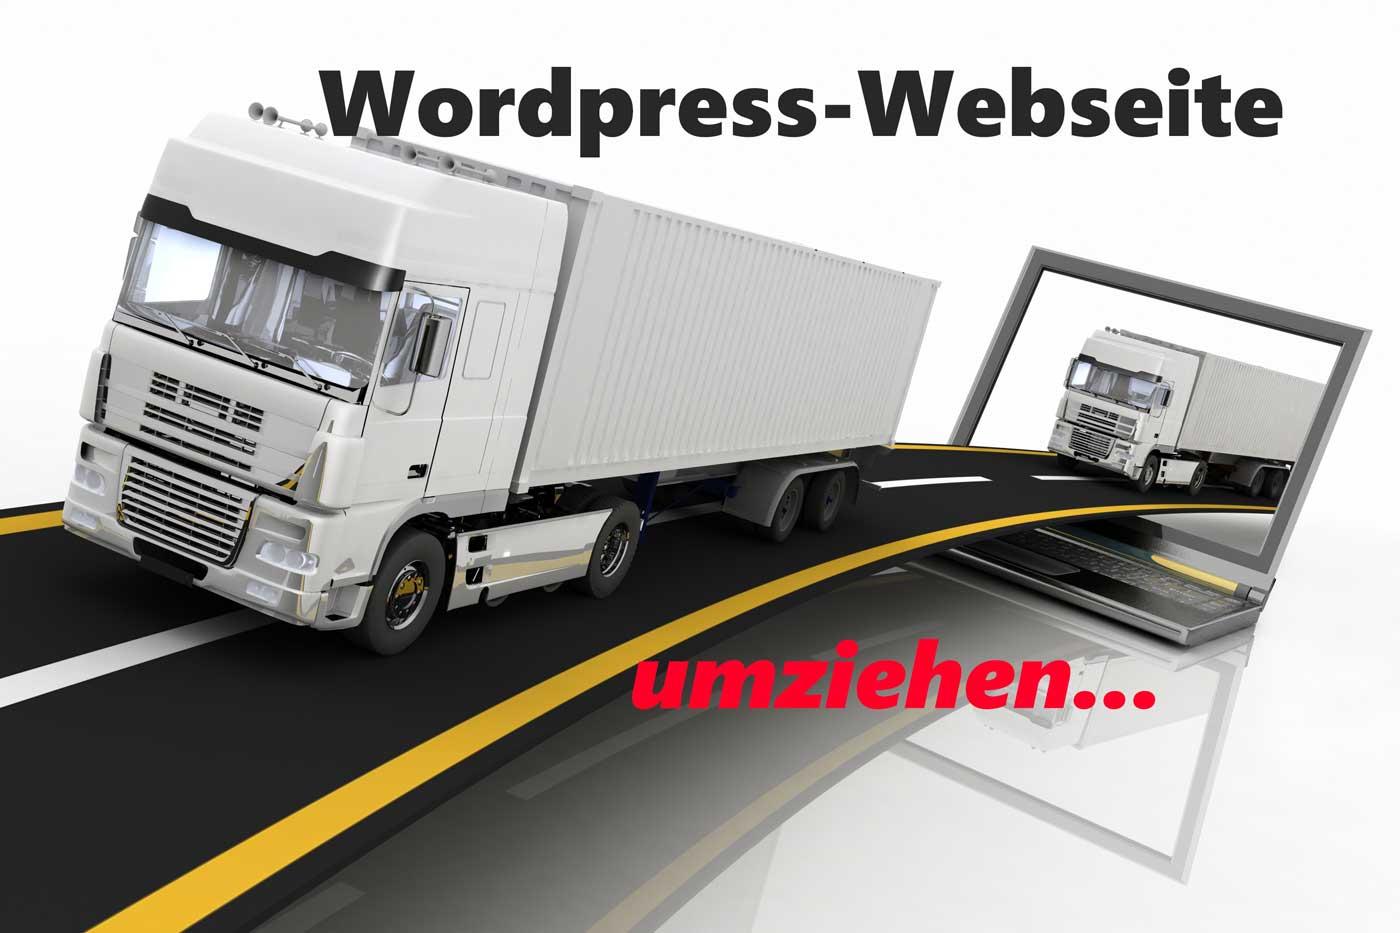 wordpress_webseite_umziehen